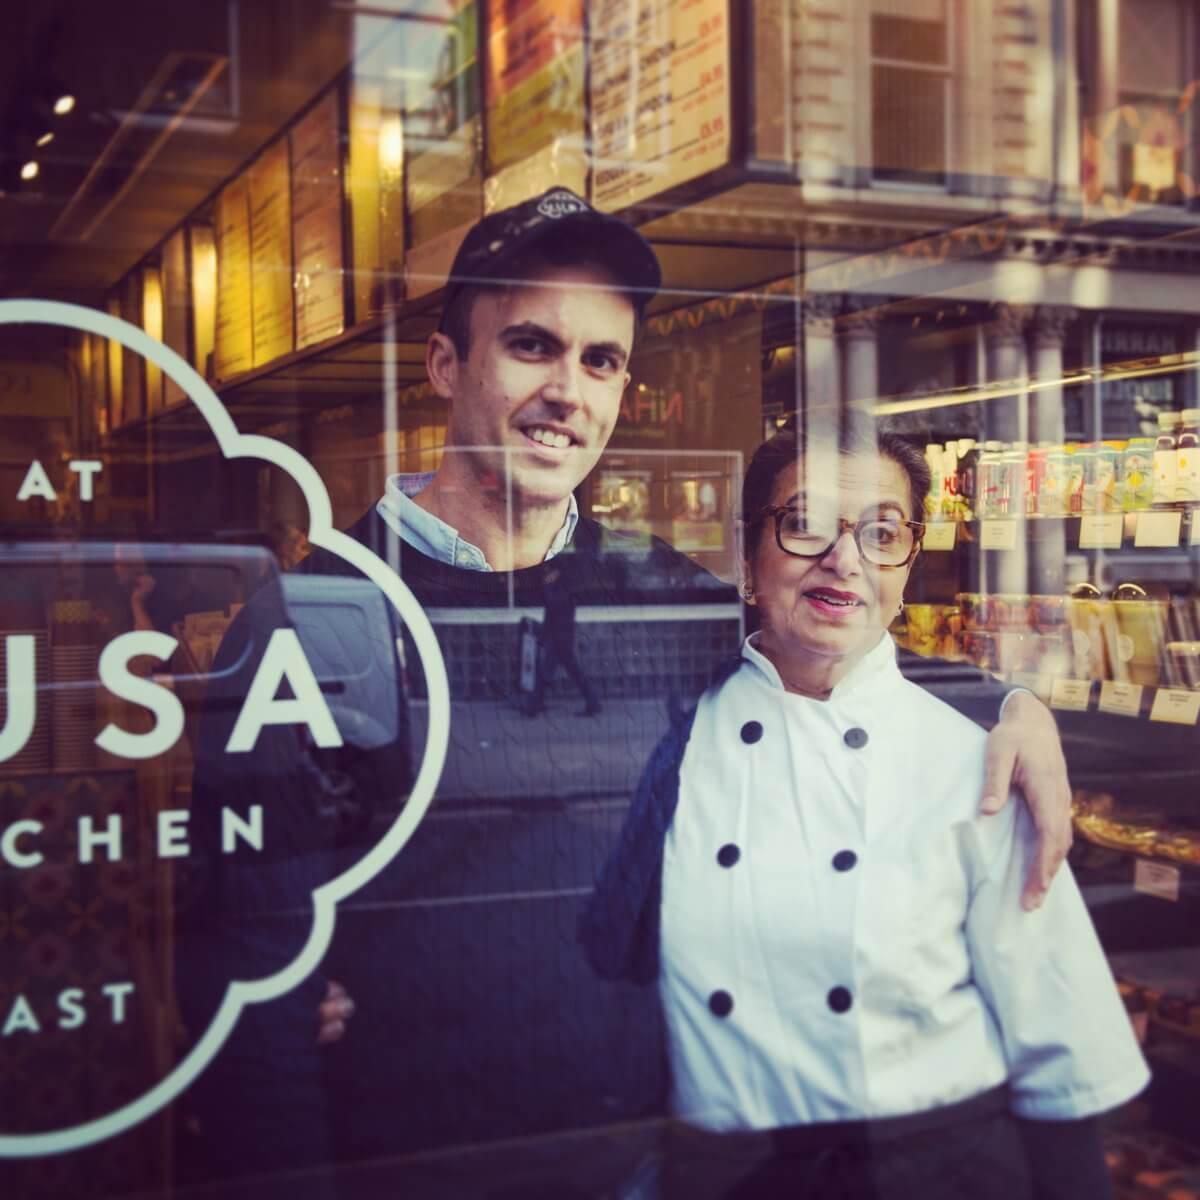 Nusa Kitchen to open three new sites this year